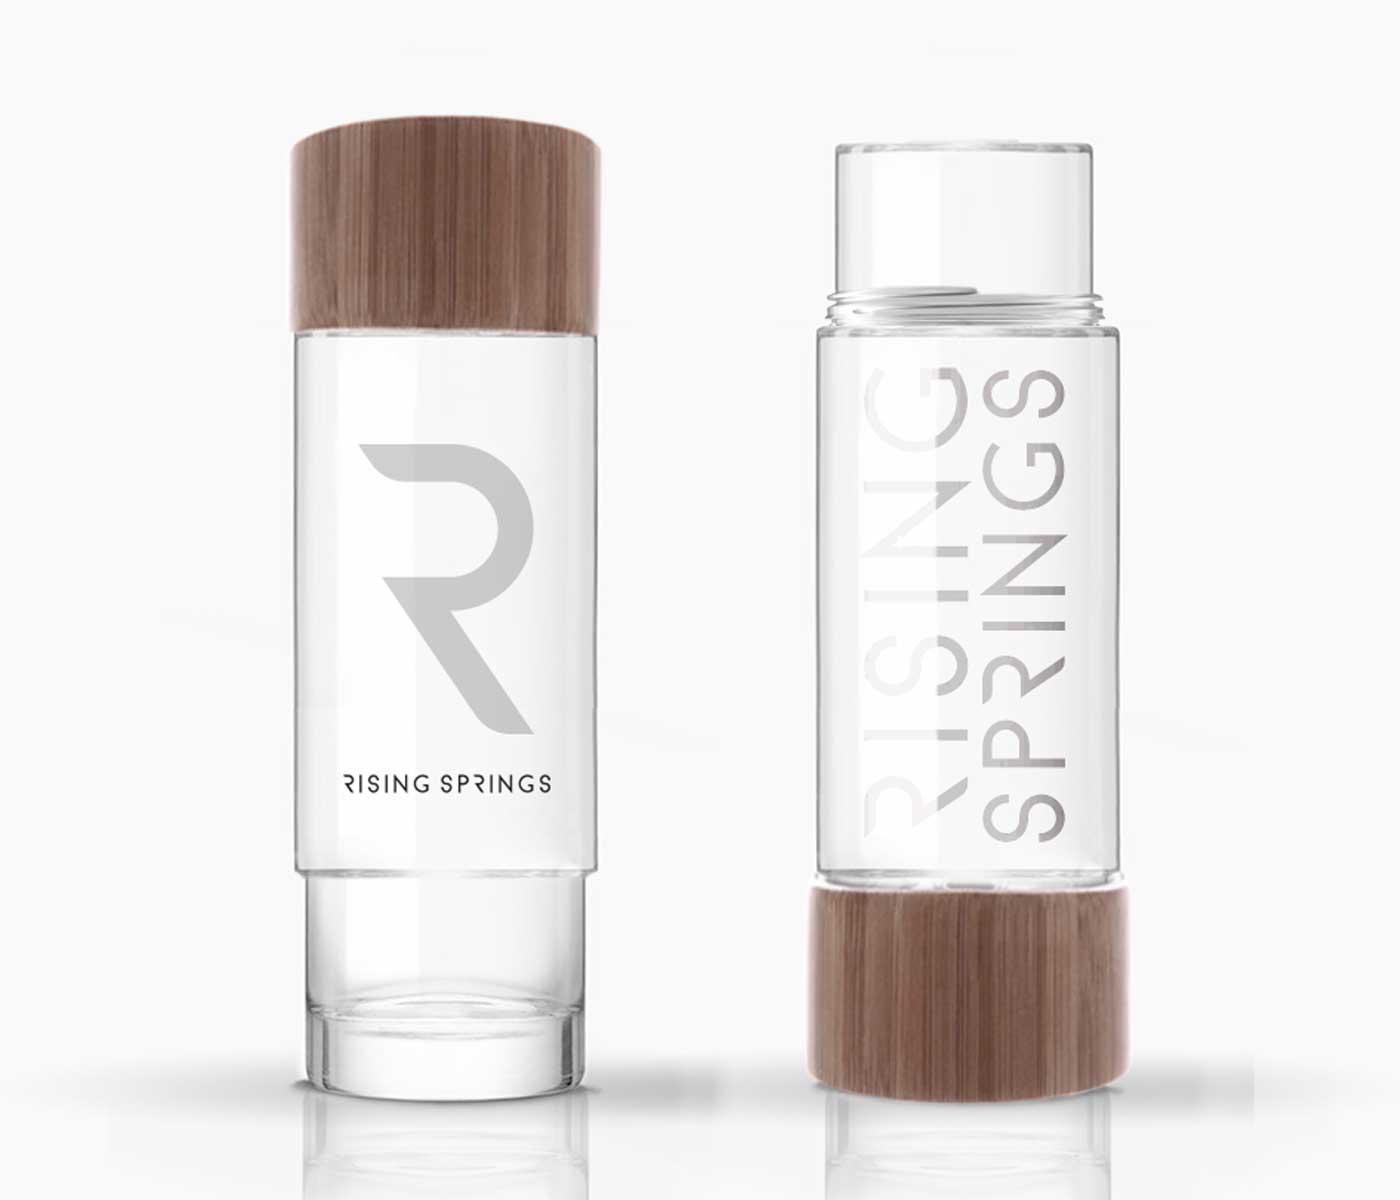 Rising Springs - Grand Identity